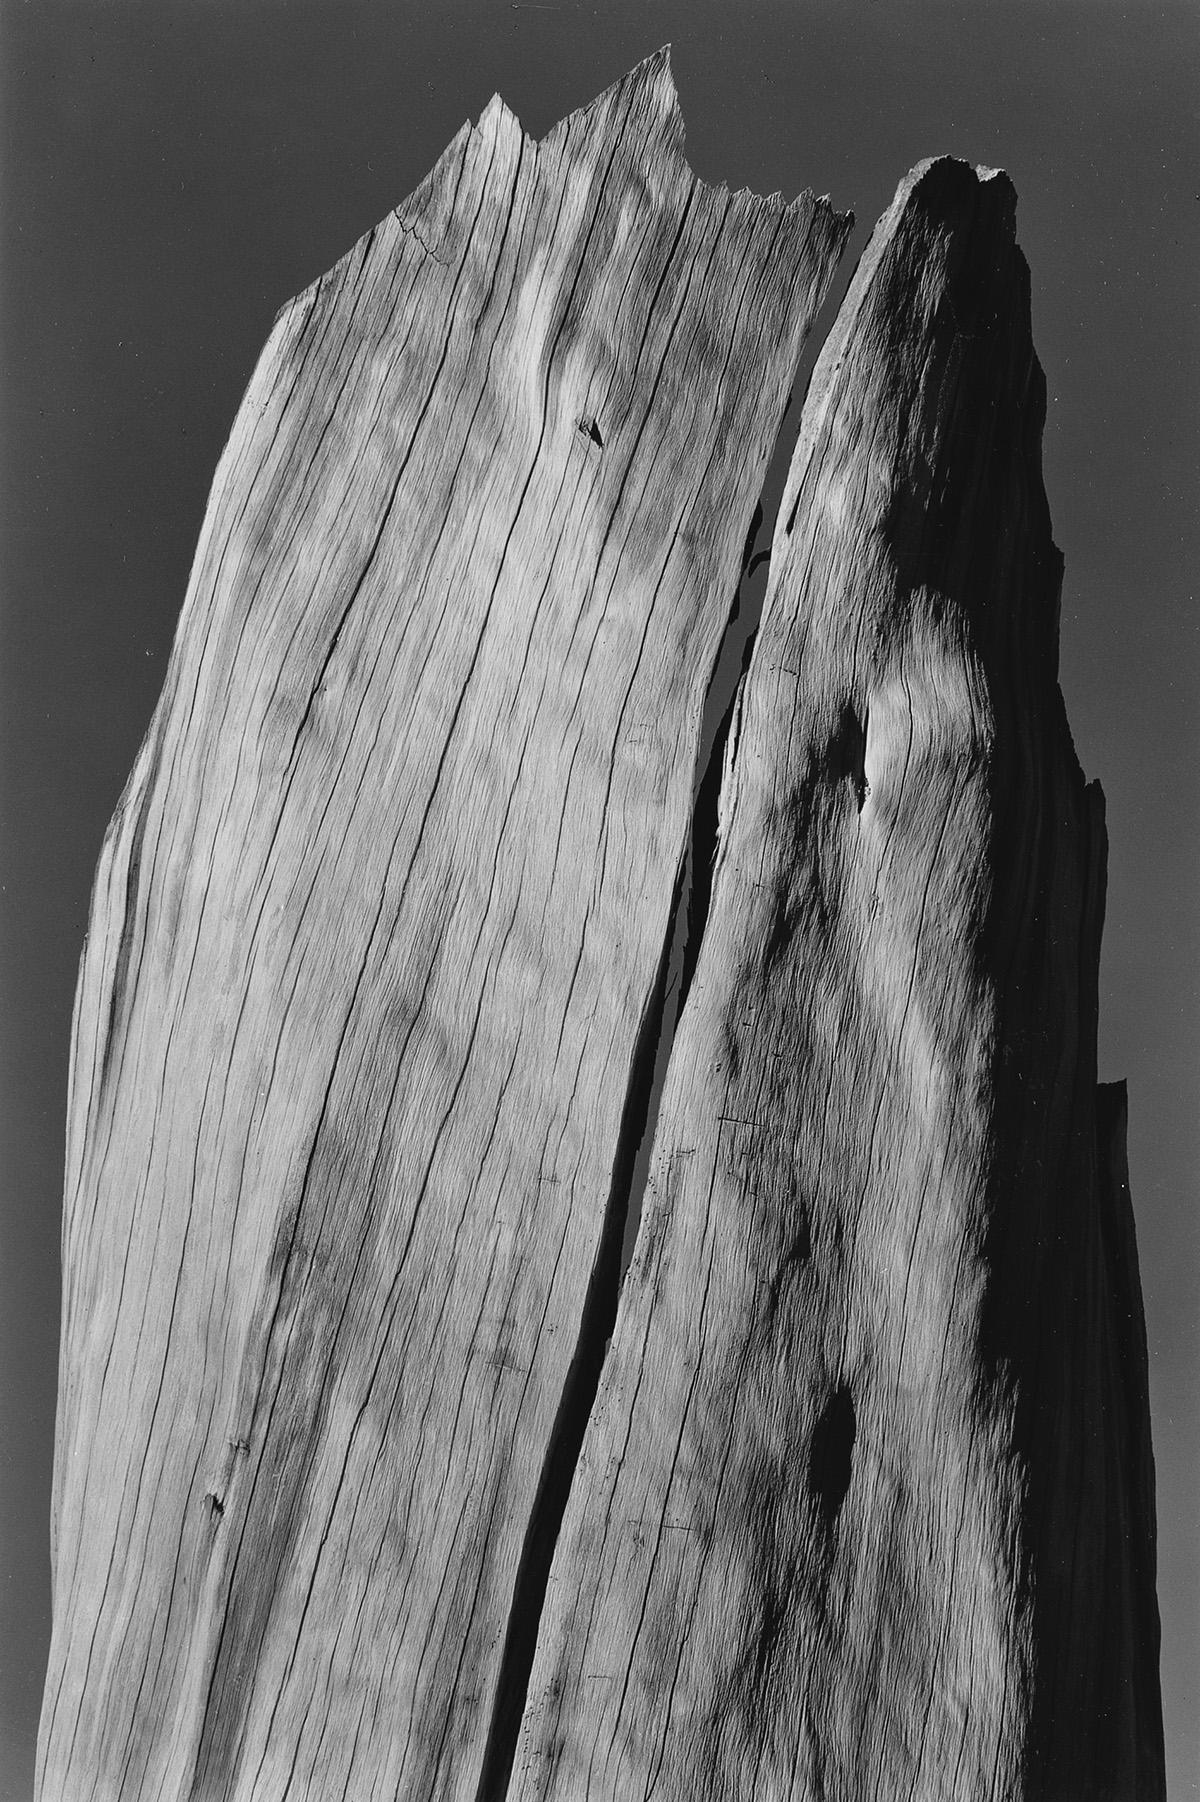 ANSEL-ADAMS-(1902-1984)-Stump-Sierra-Nevada